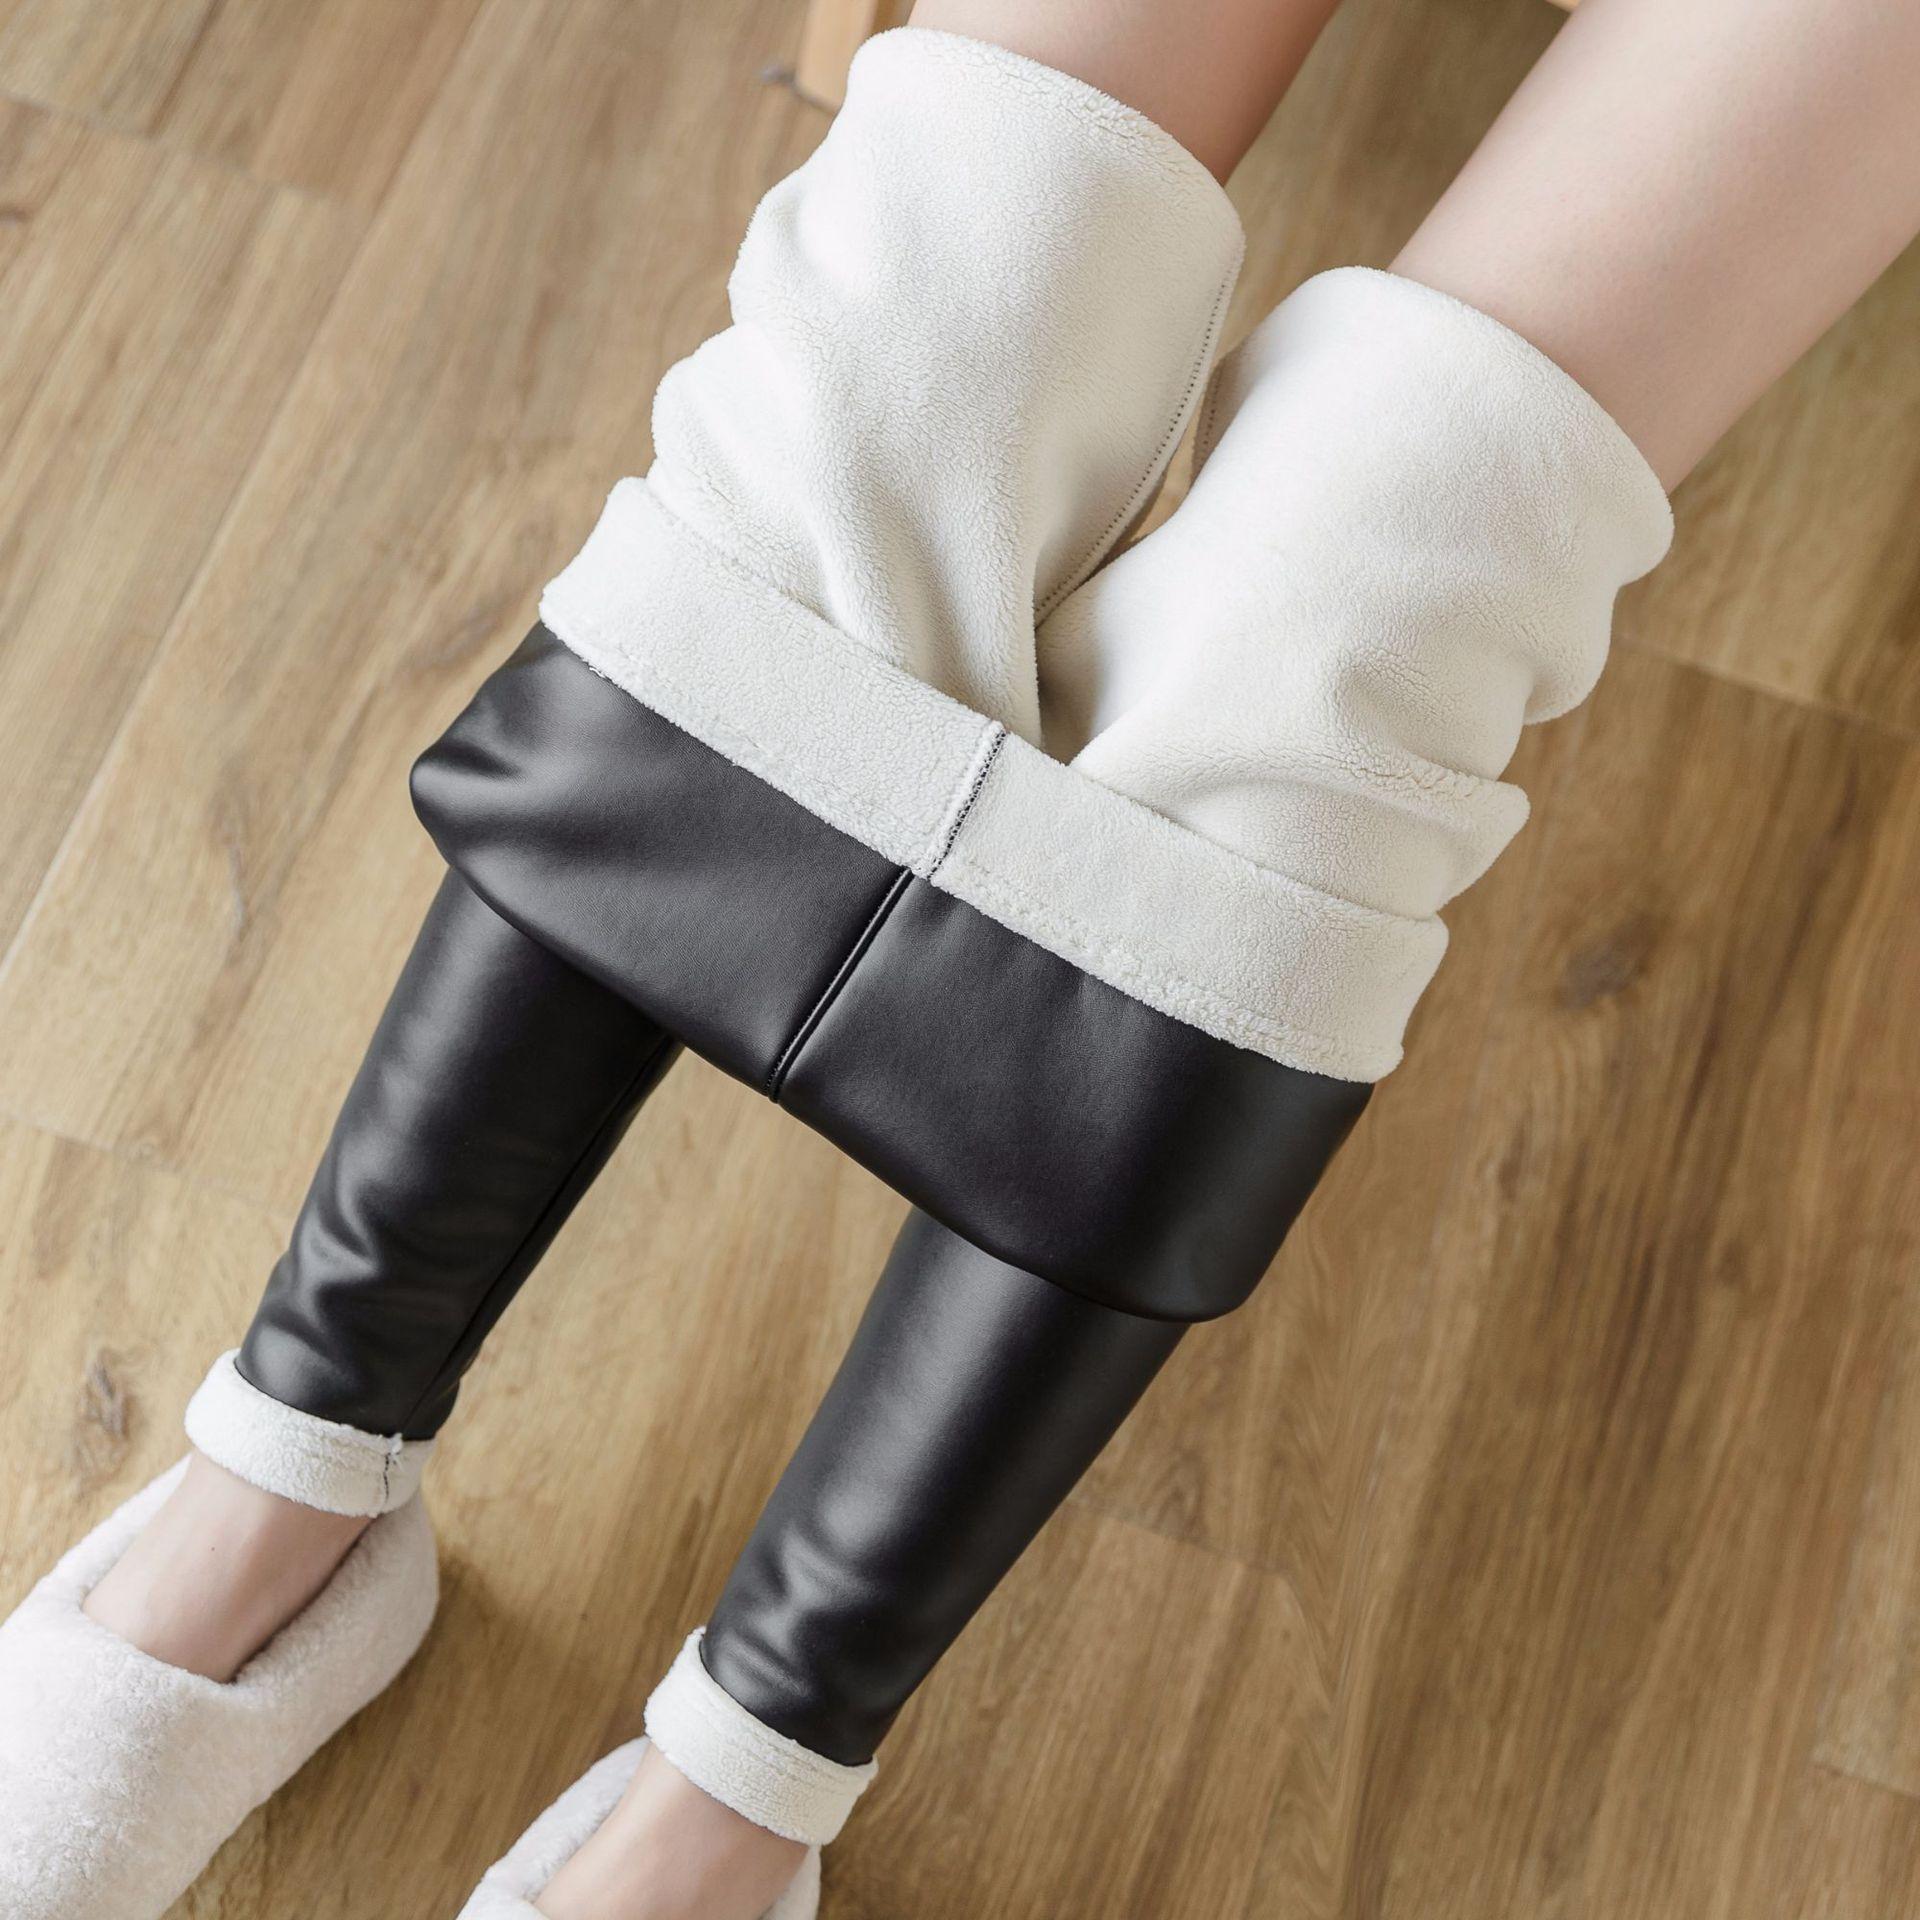 Women Winter Warm Slim PU Leather Leggings High Waist Skinny Faux Leather Pants Female Thick Fleece Velvet Legging Plus Size 4XL